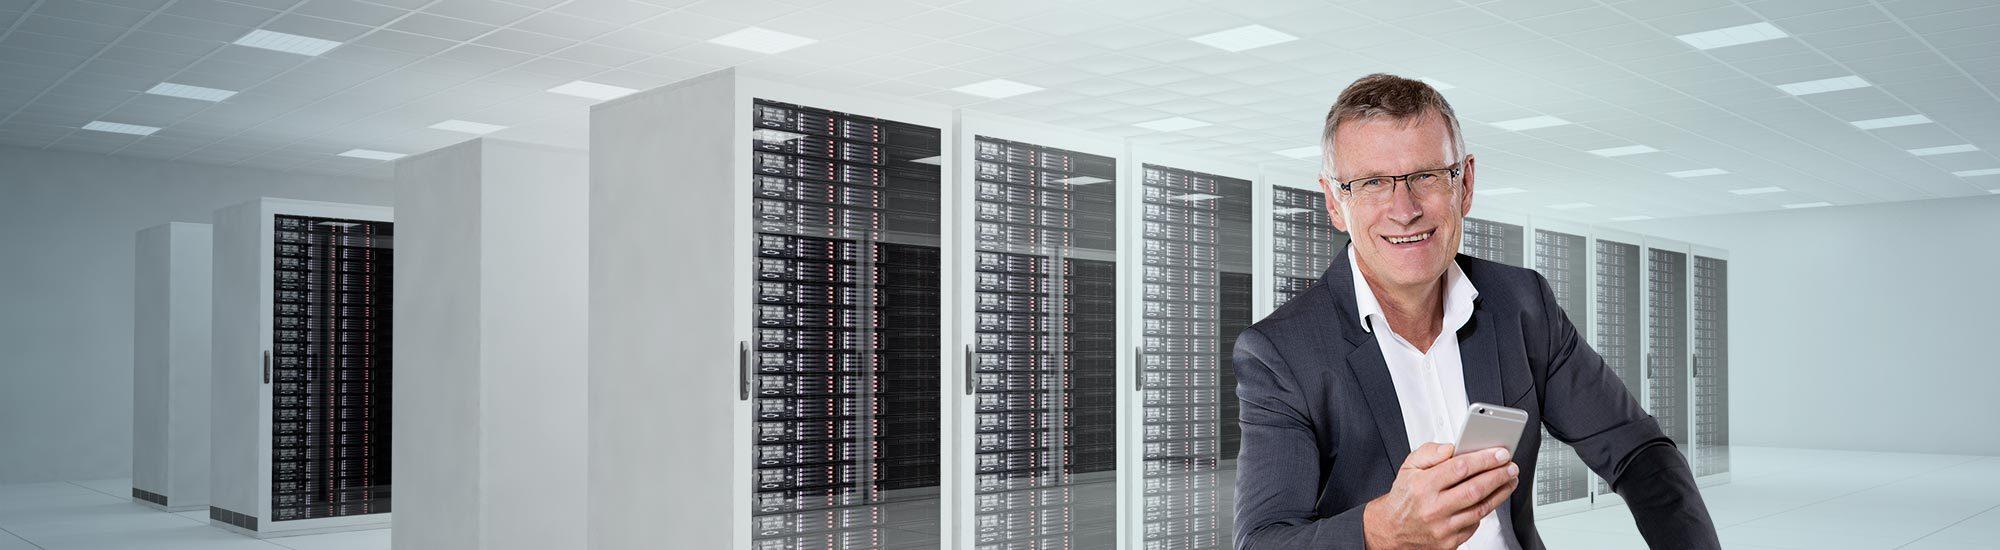 advasco GmbH | Unternehmen